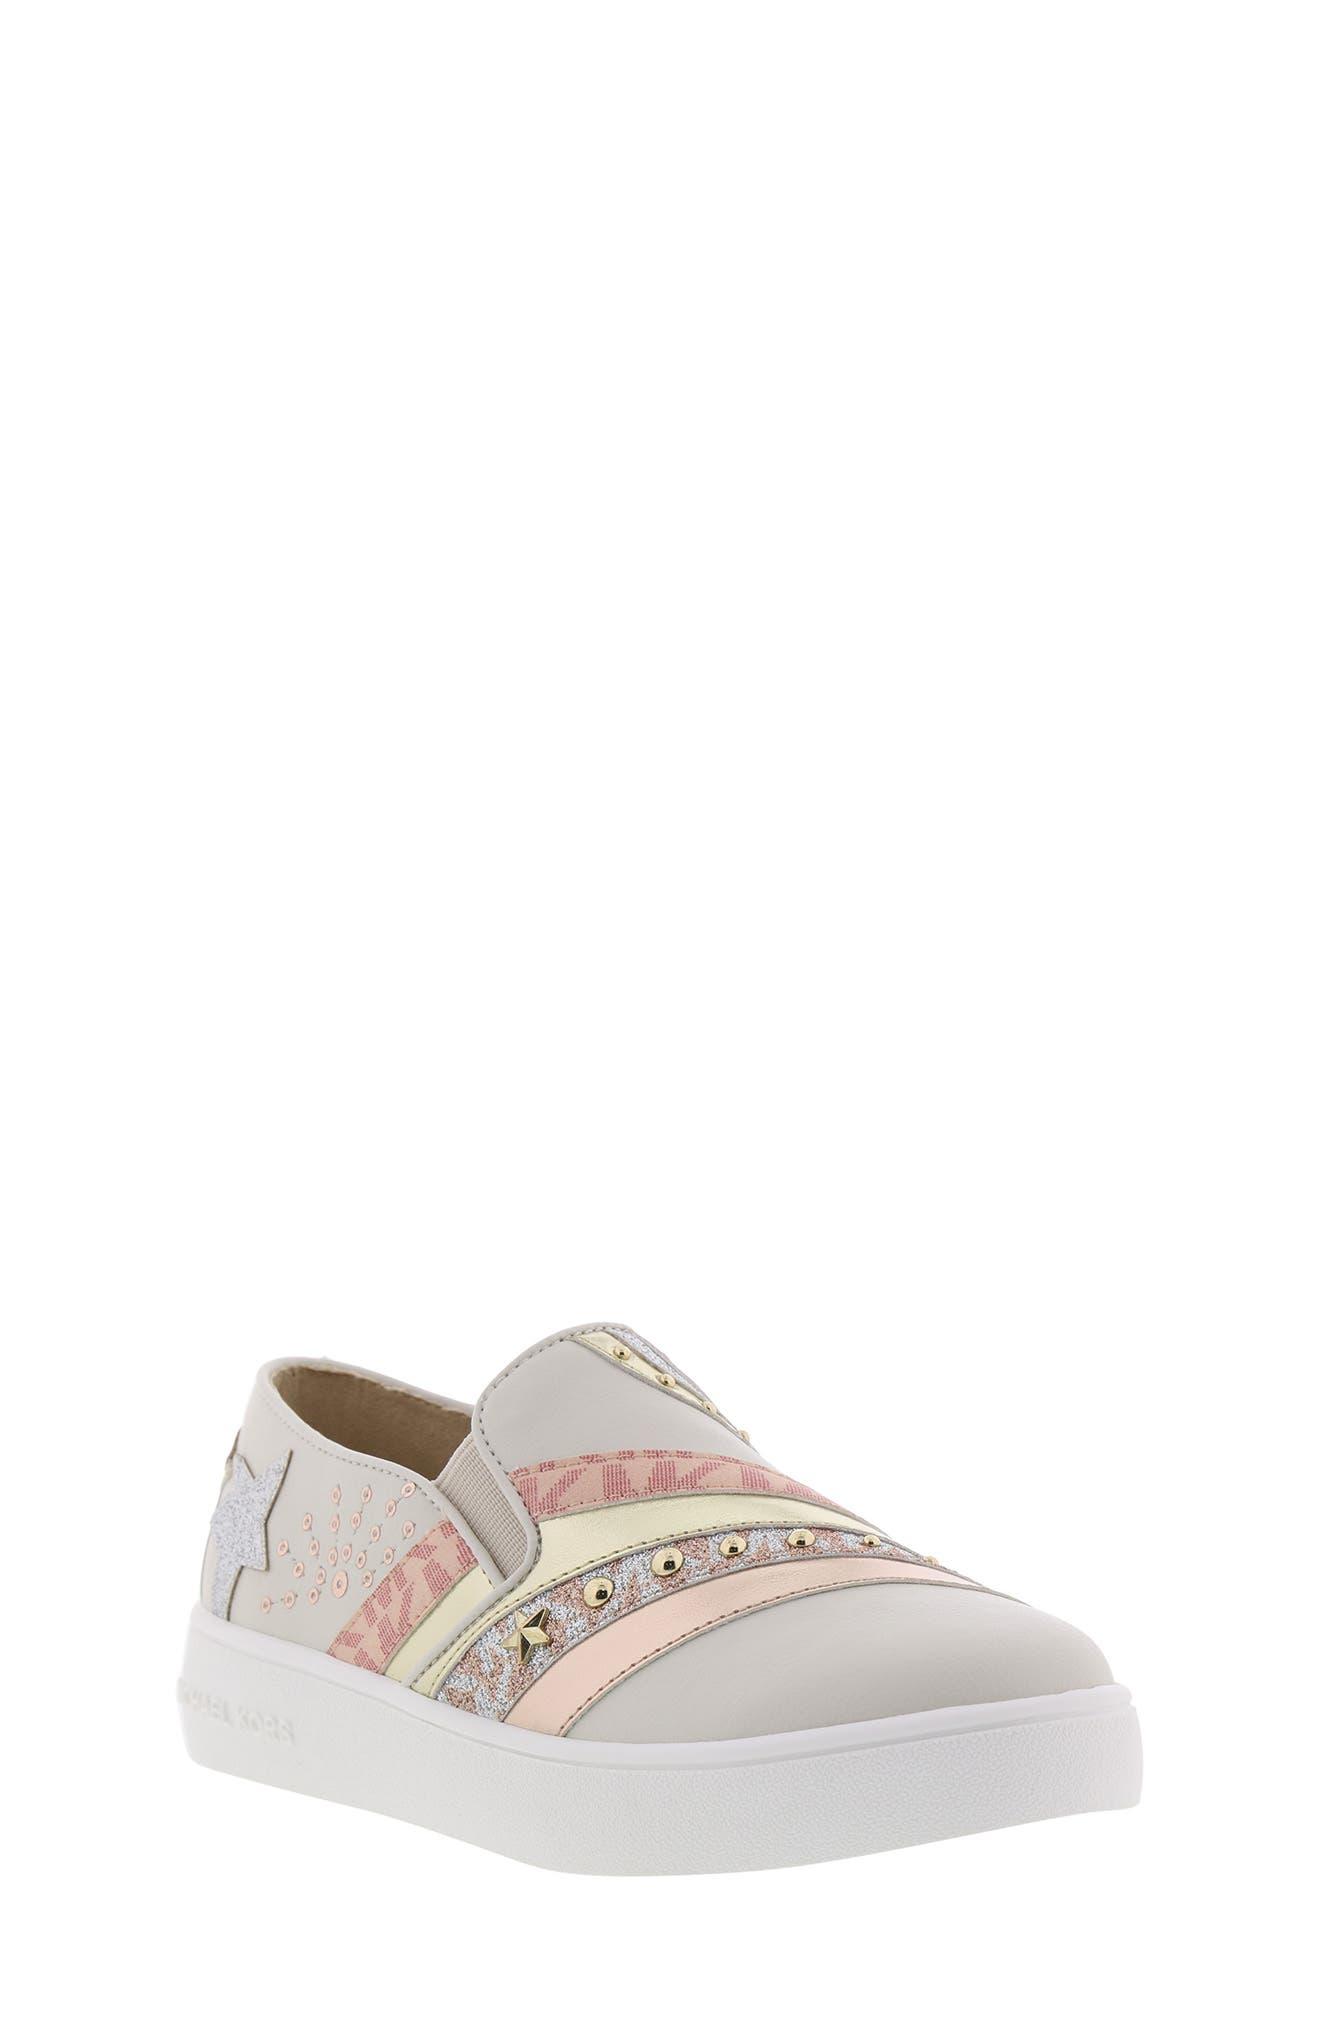 Jem Starlight Slip-On Sneaker,                             Main thumbnail 1, color,                             VANILLA